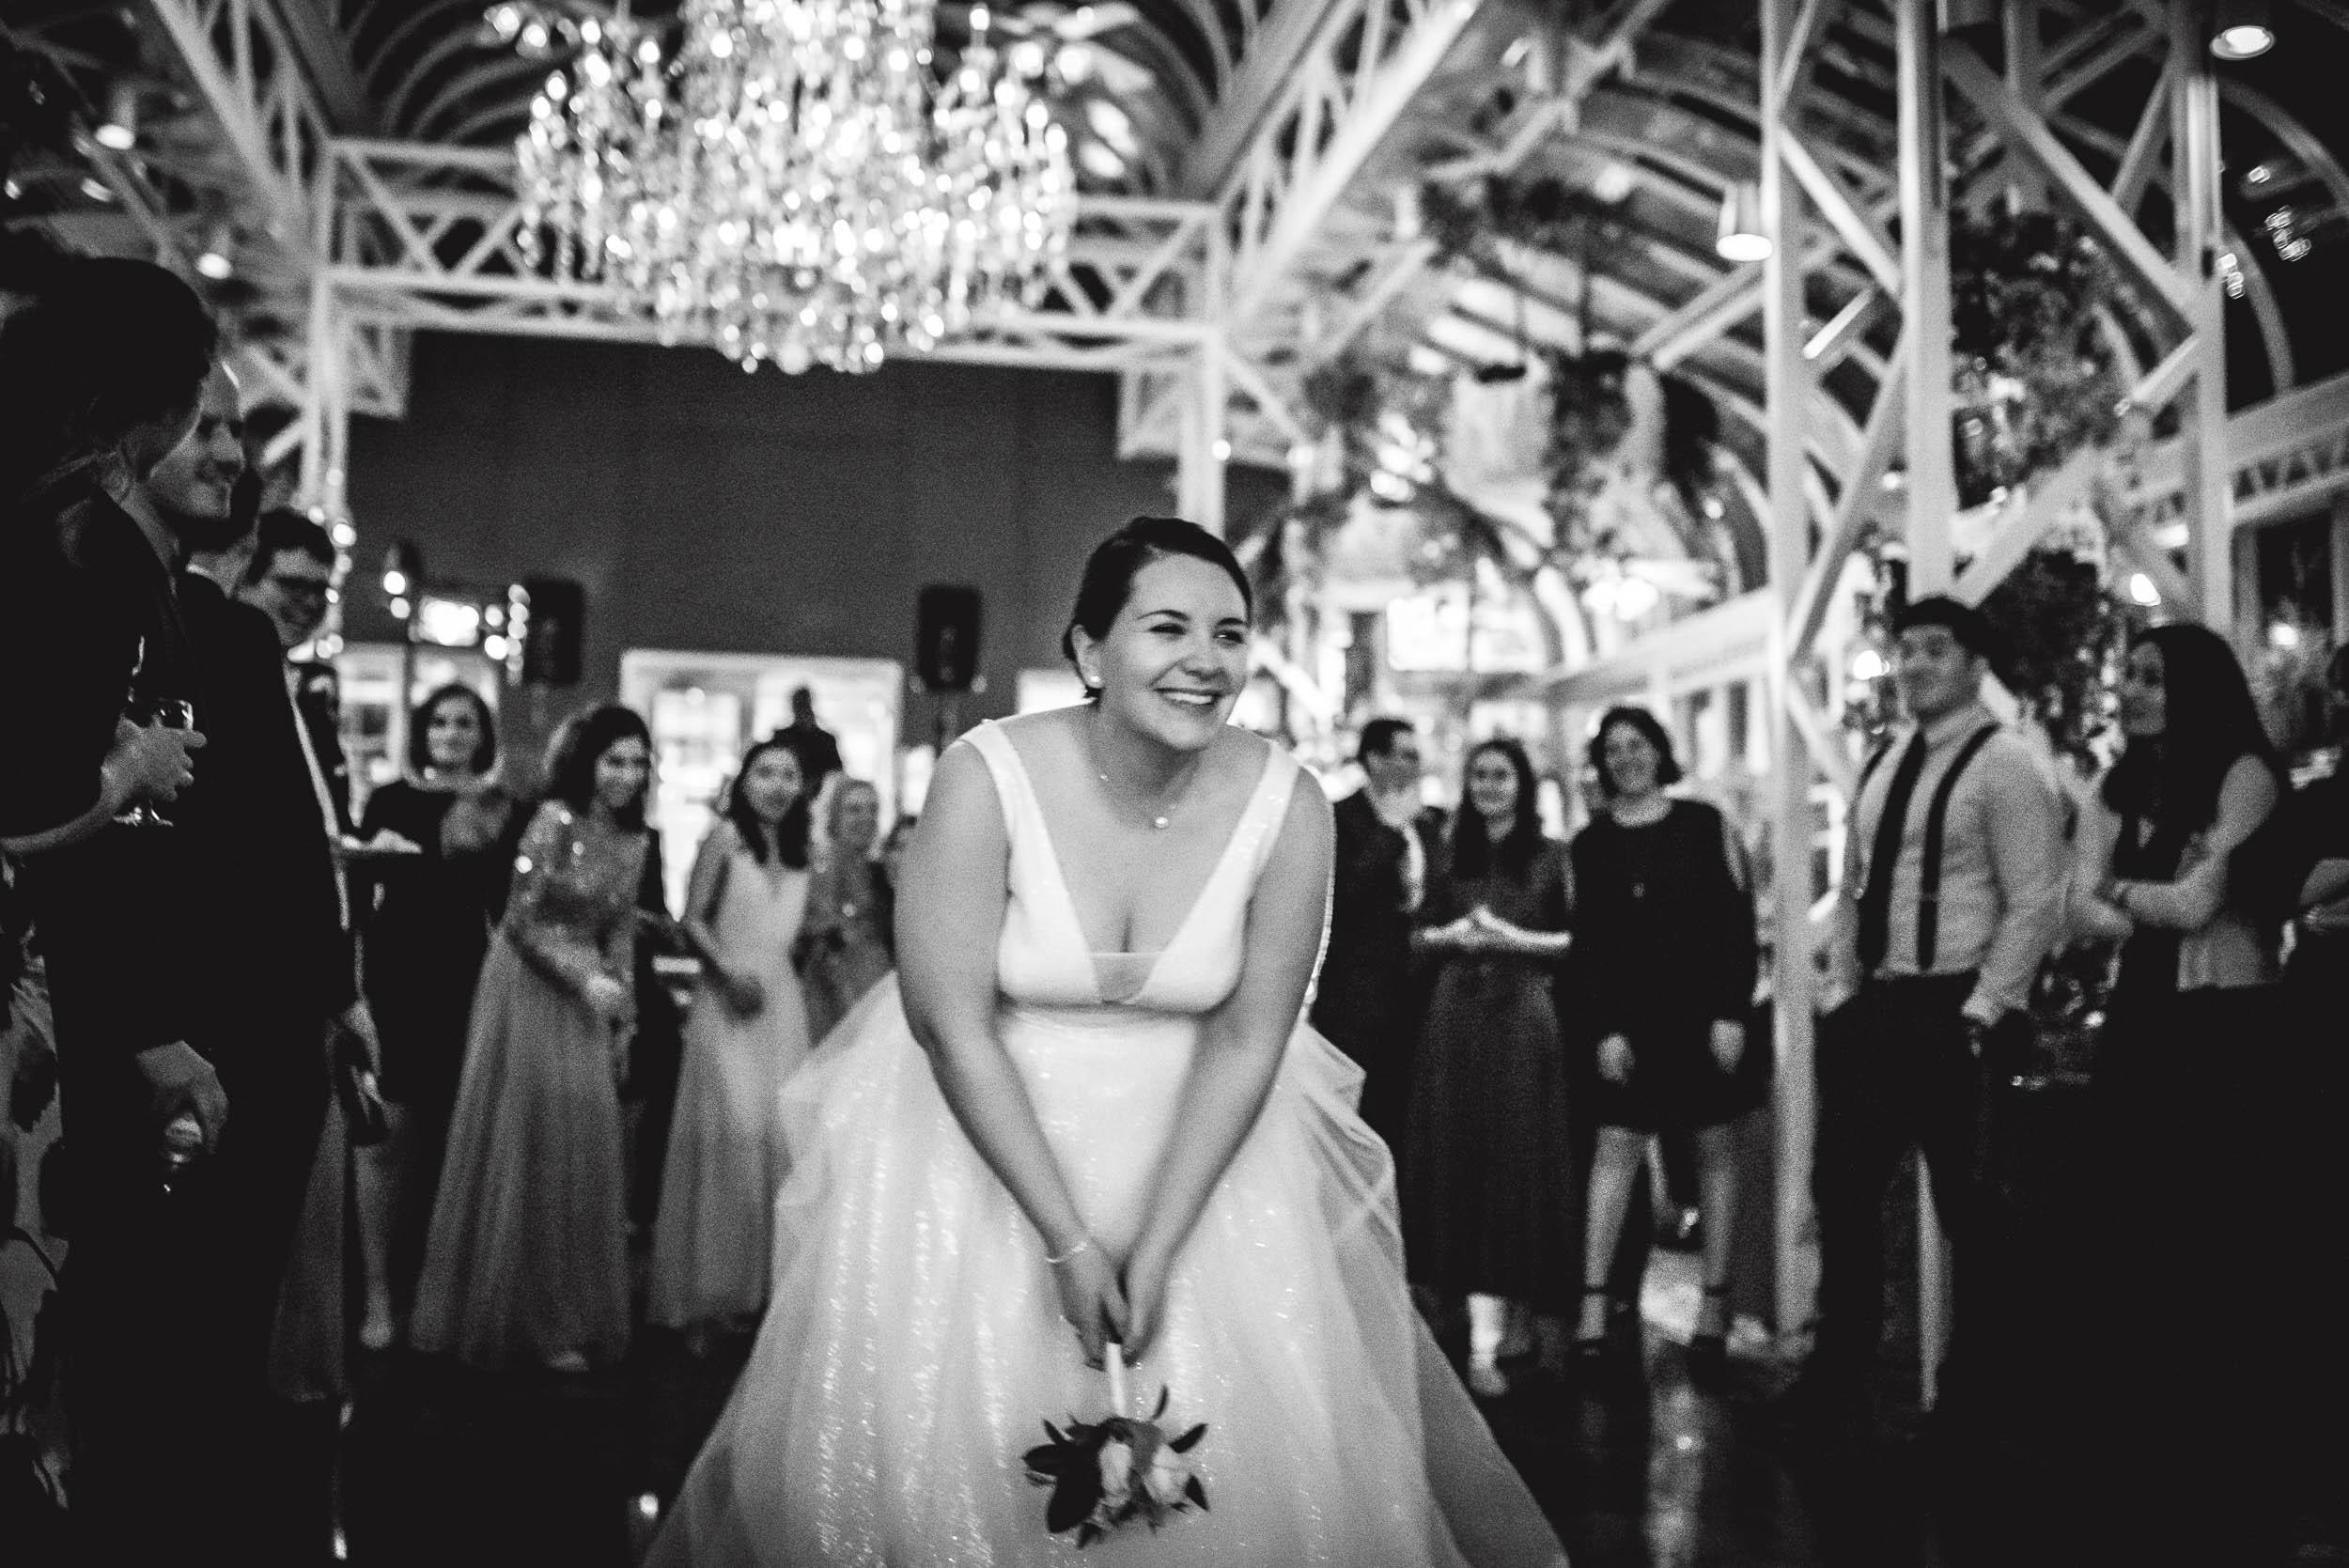 KatieandMathias_Morristown_NewJersey_Wedding_Church_Assumption_Madison_Hotel(60of65).jpg